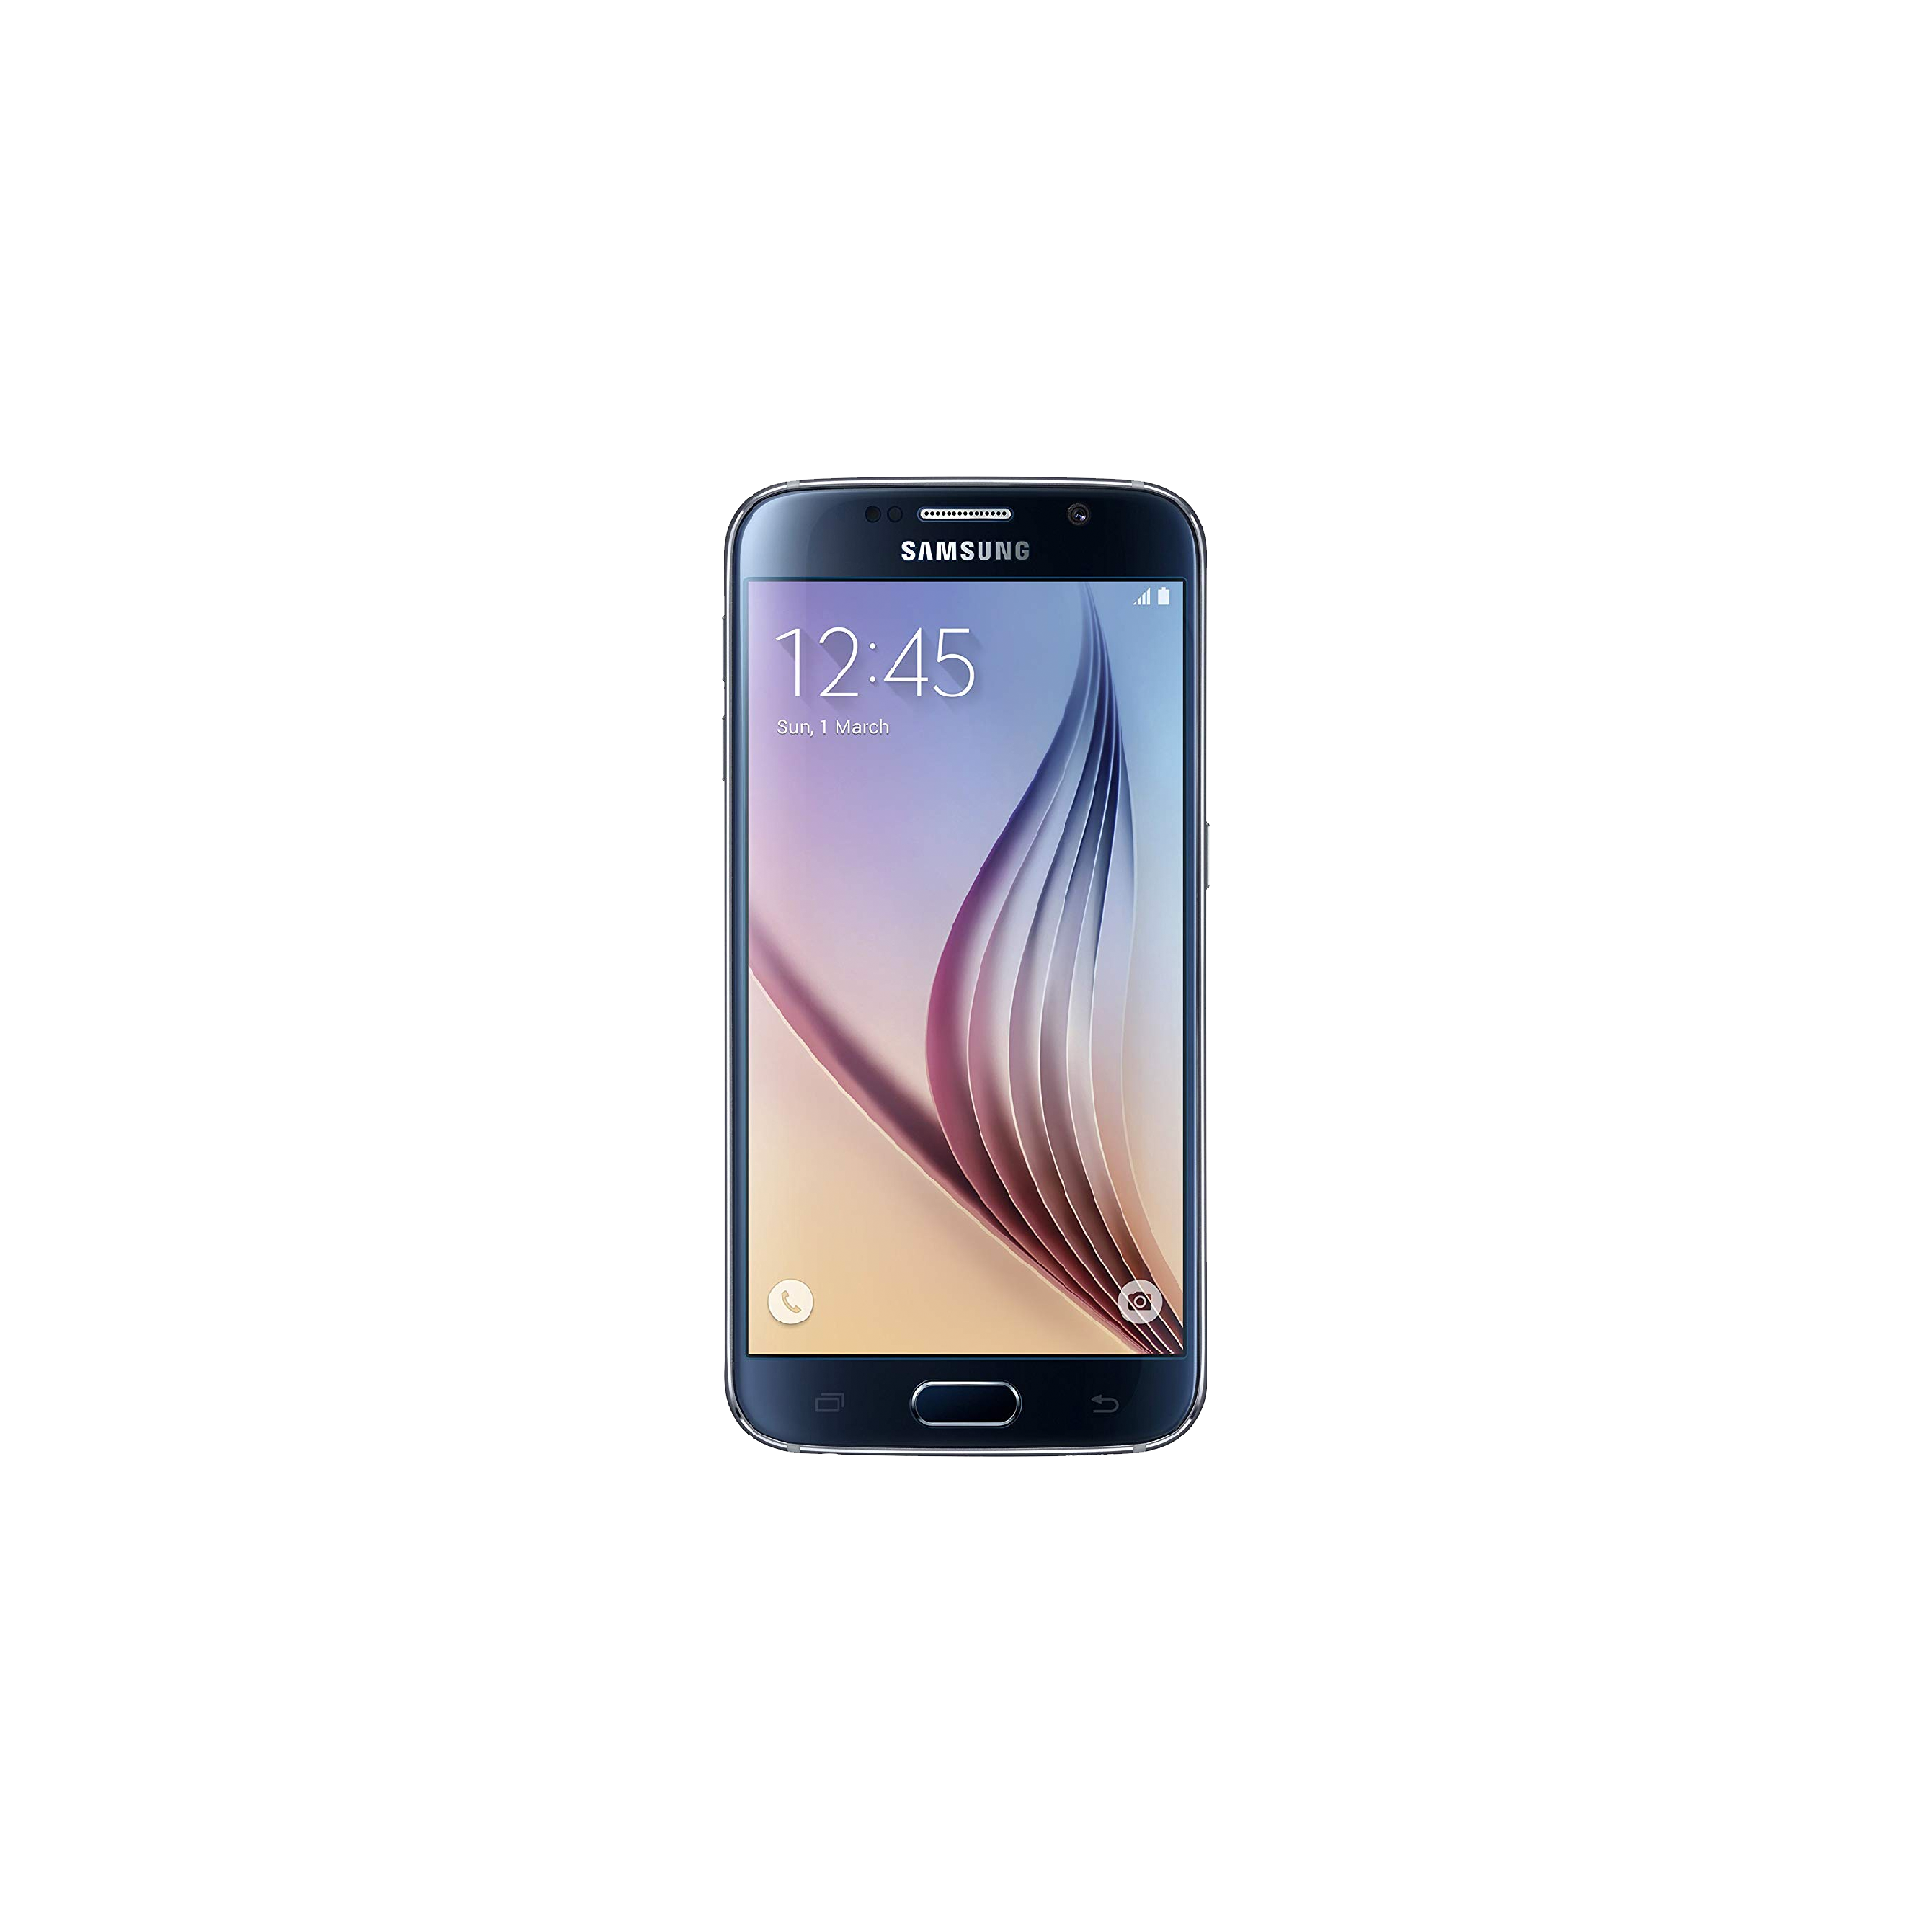 Samsung S6 | $180 + tax